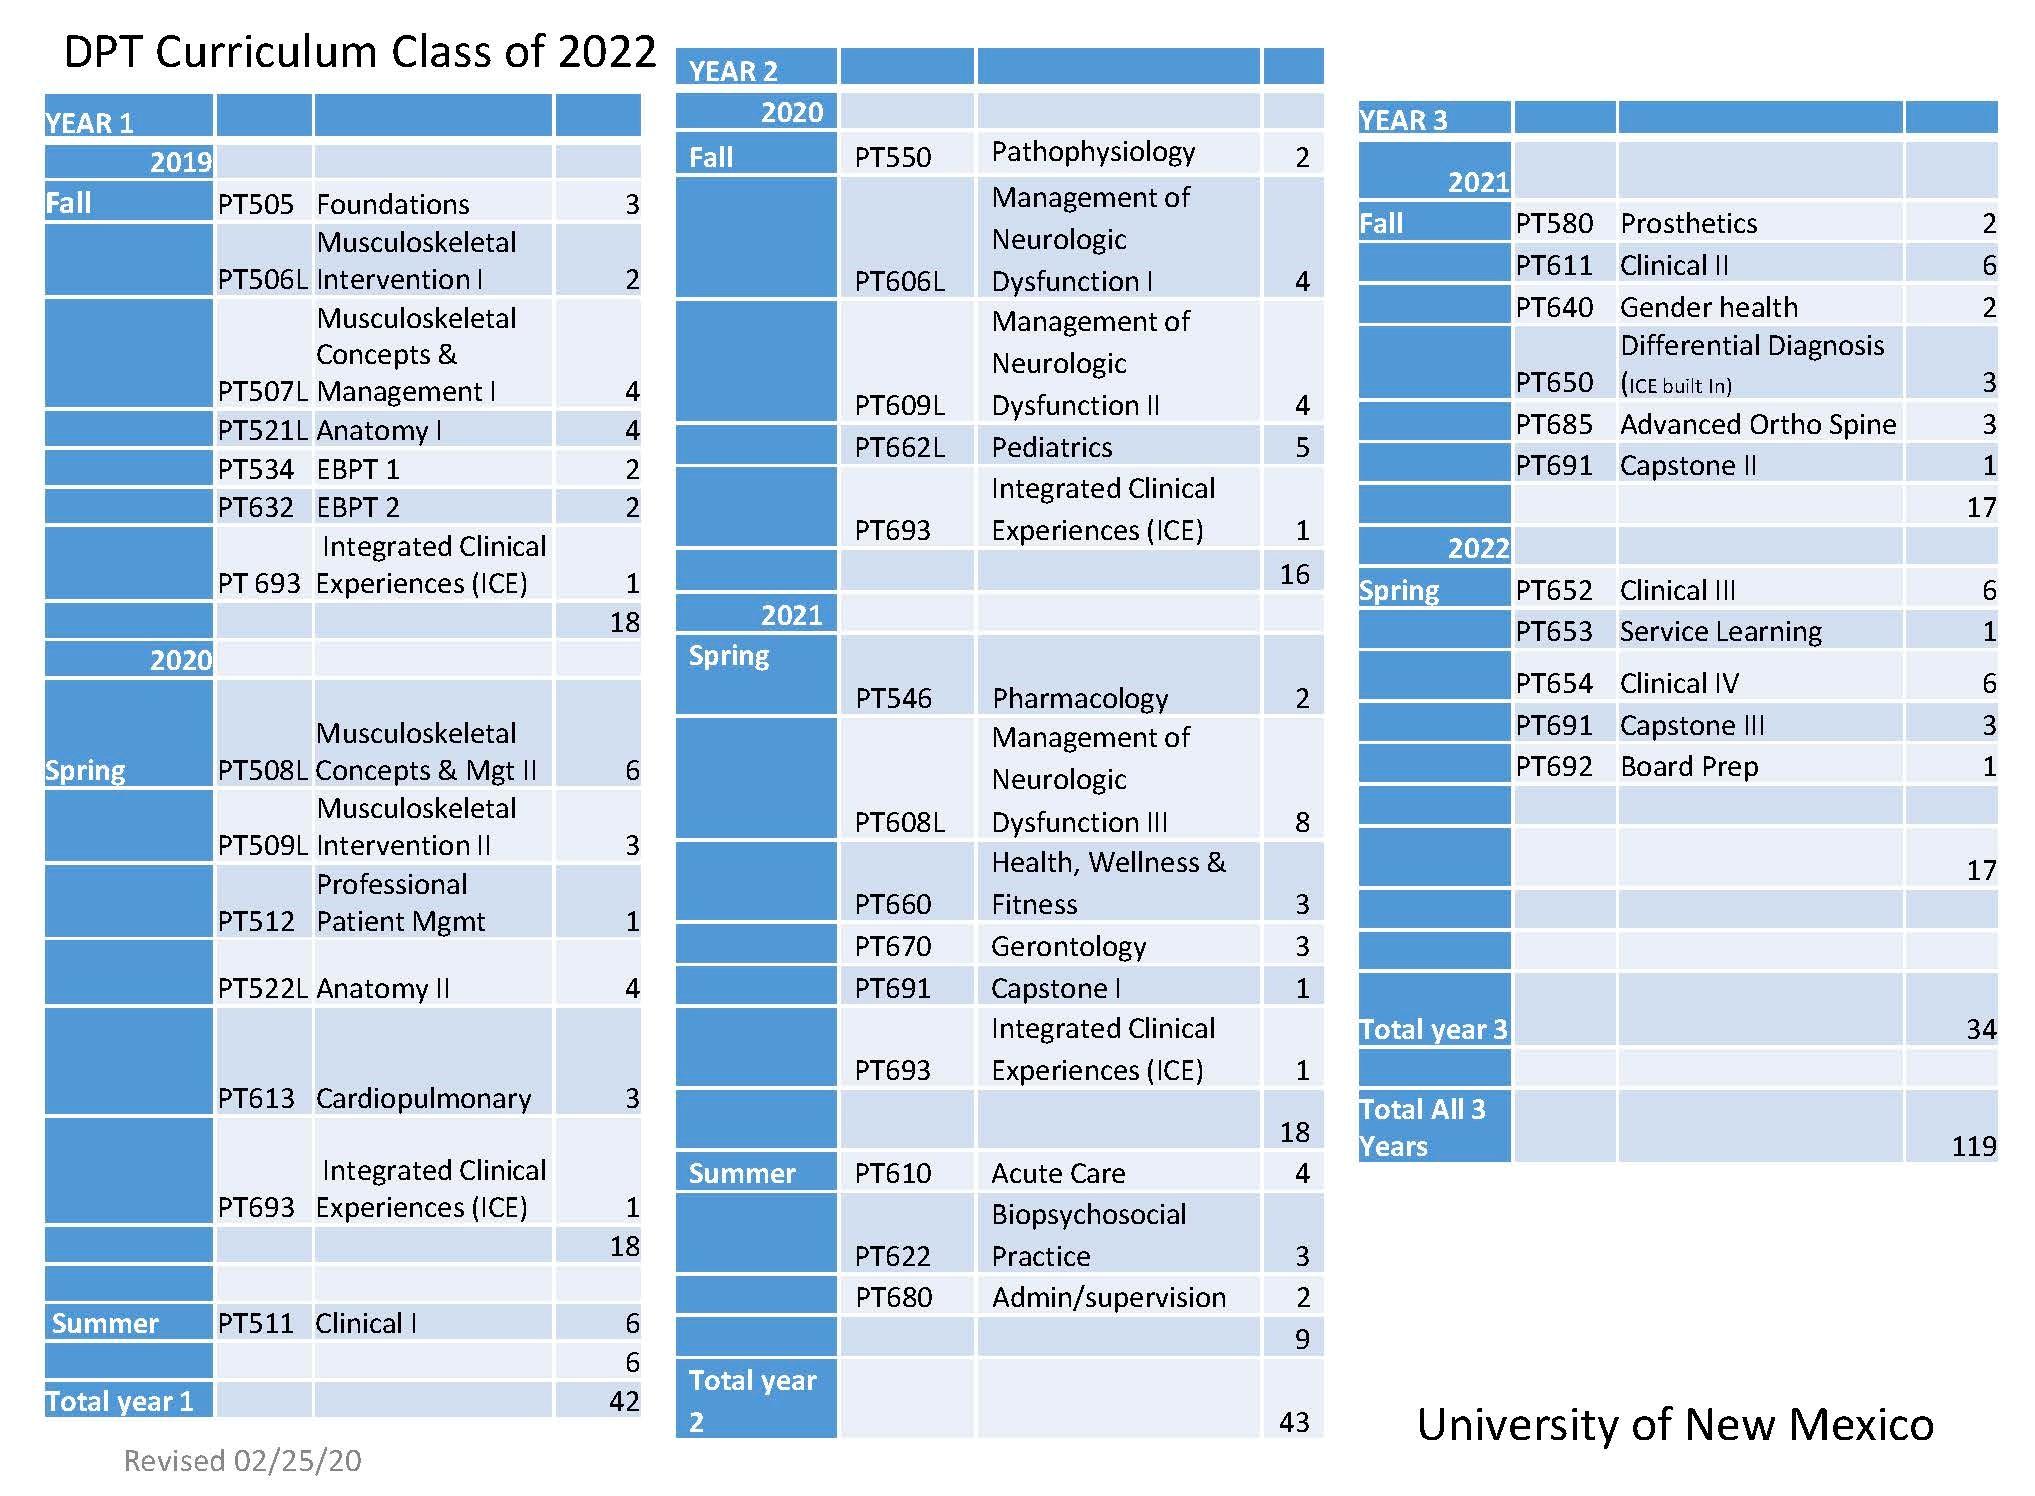 Unm Academic Calendar Fall 2020.University Communication Marketing The University Of New